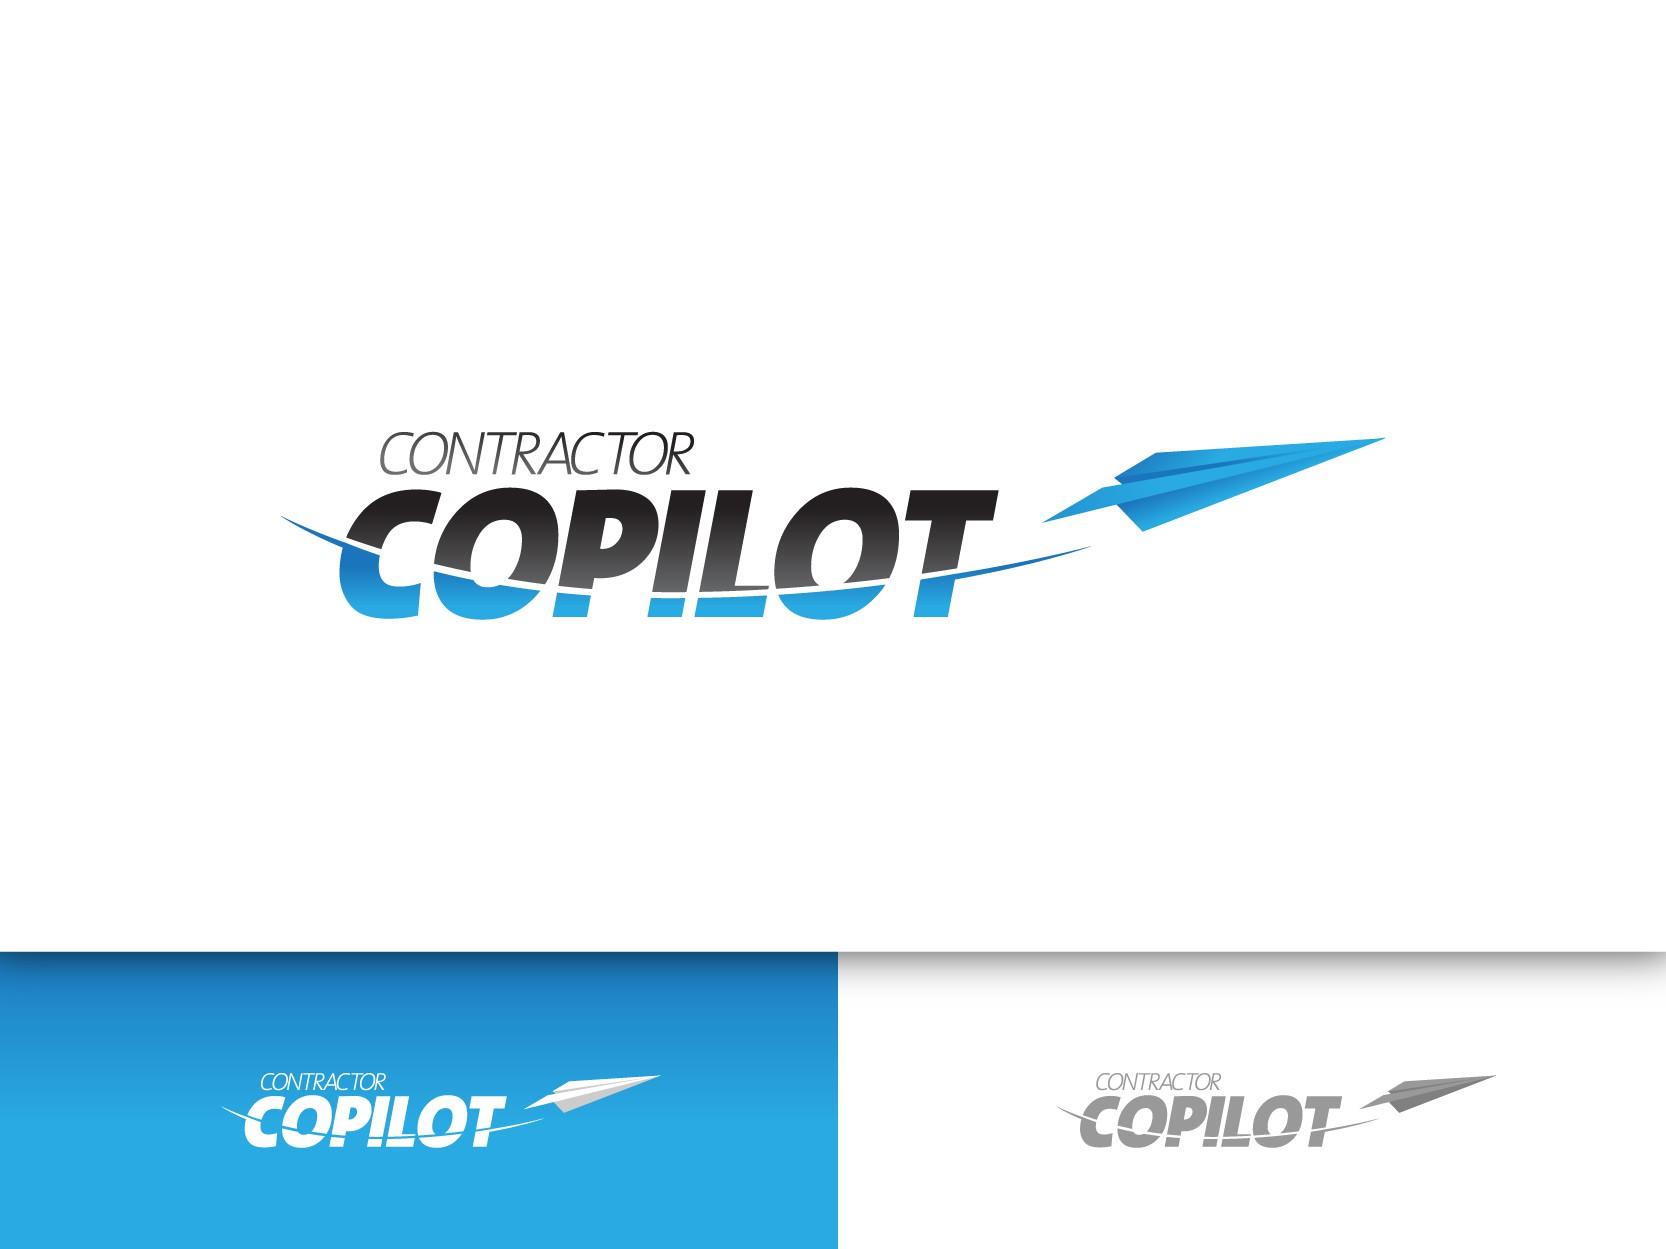 Contractor Copilot needs a logo!